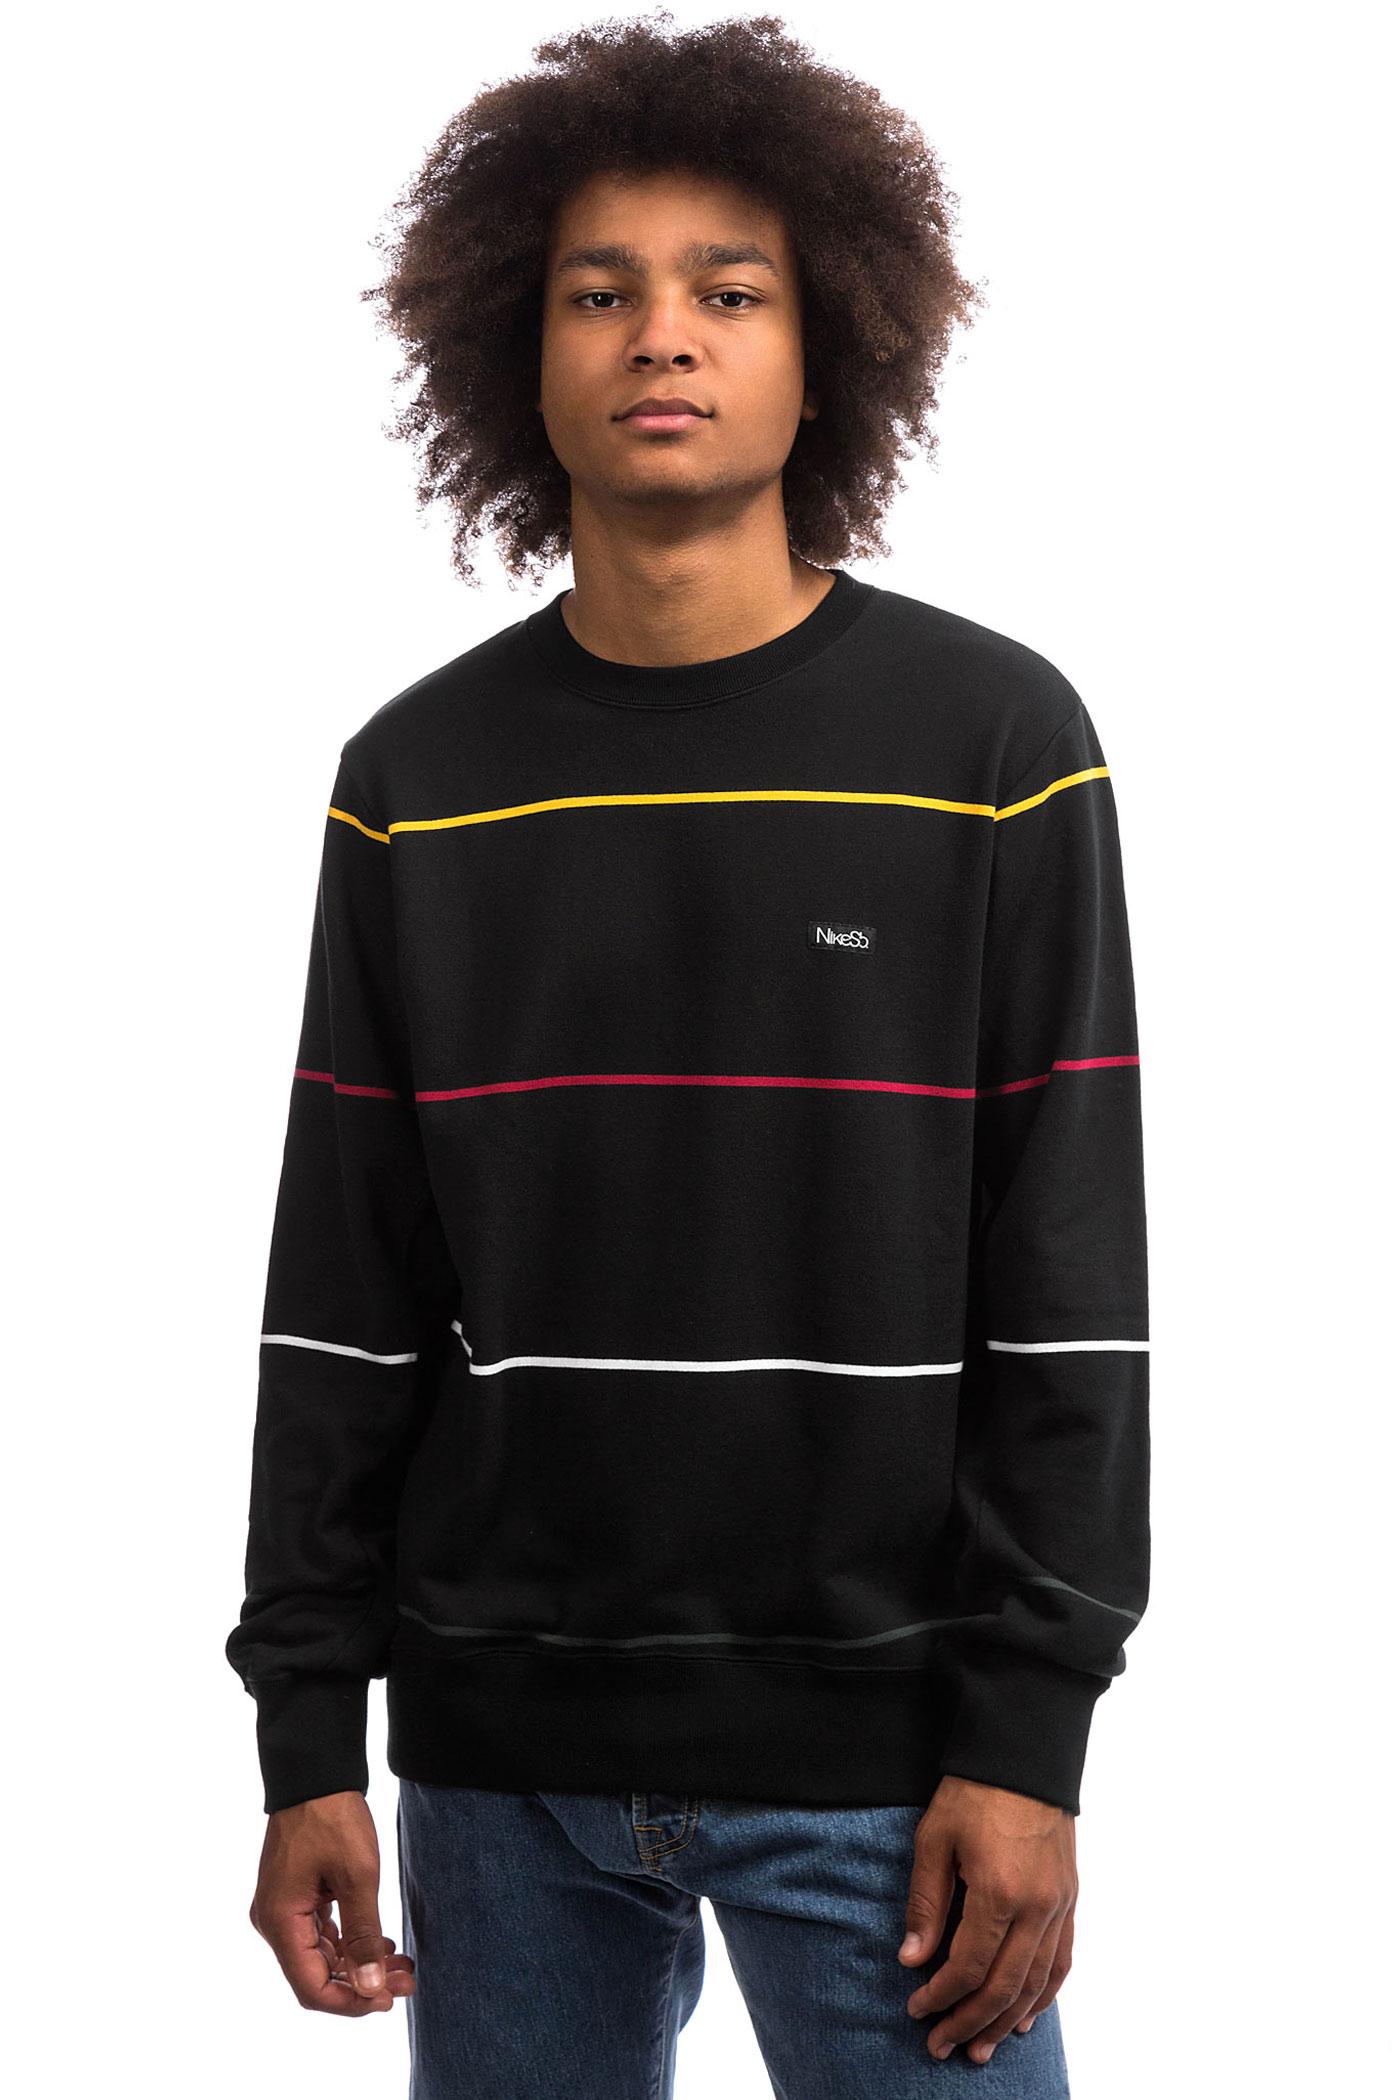 Nike Sb Everett Black Stripe Sweatshirtblack OPTXkiuZ